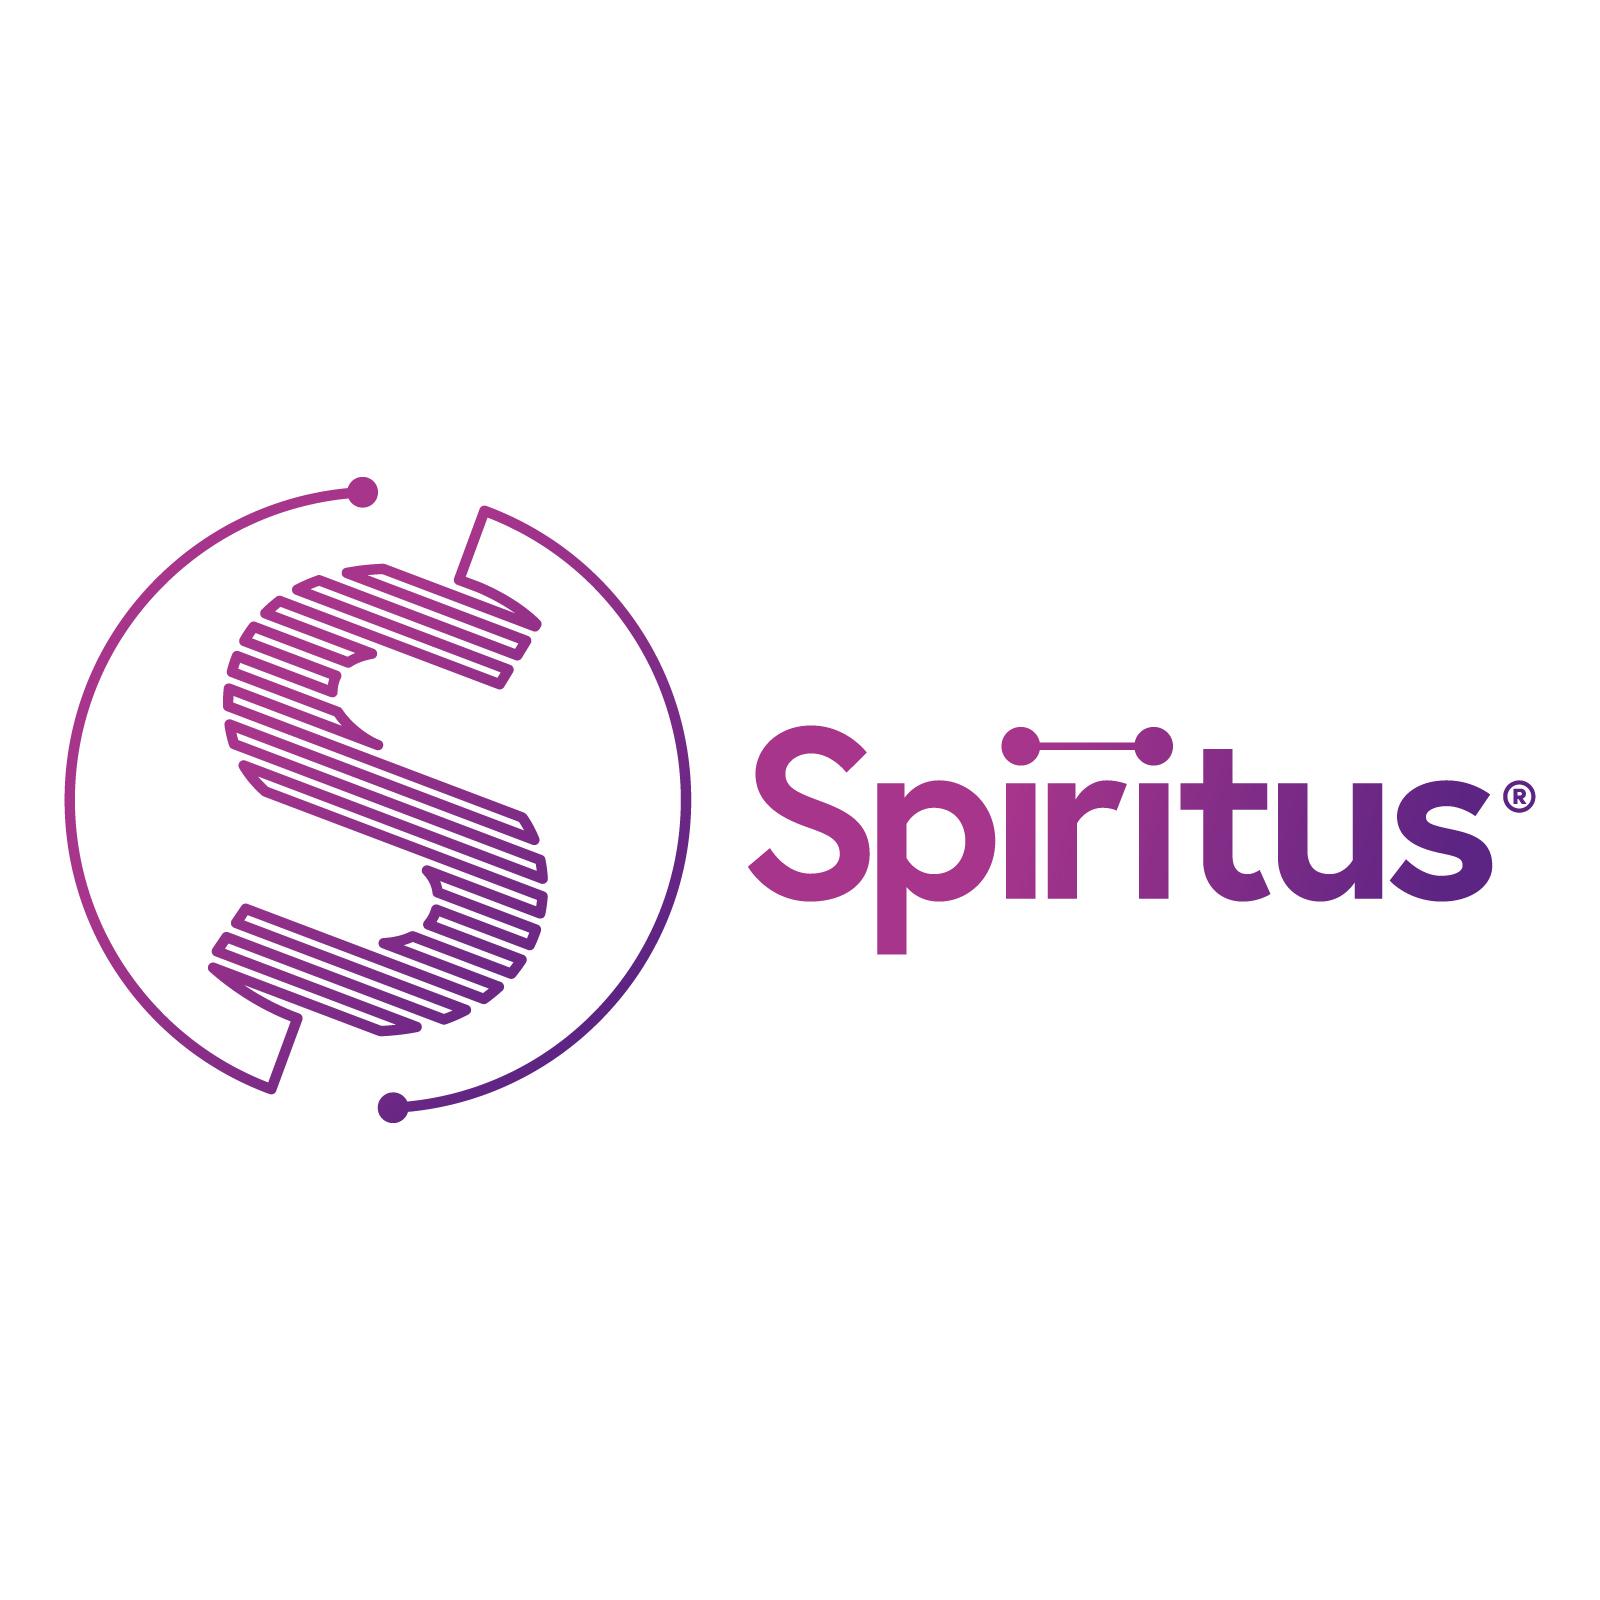 SPIRITUS_5@2x-100.jpg